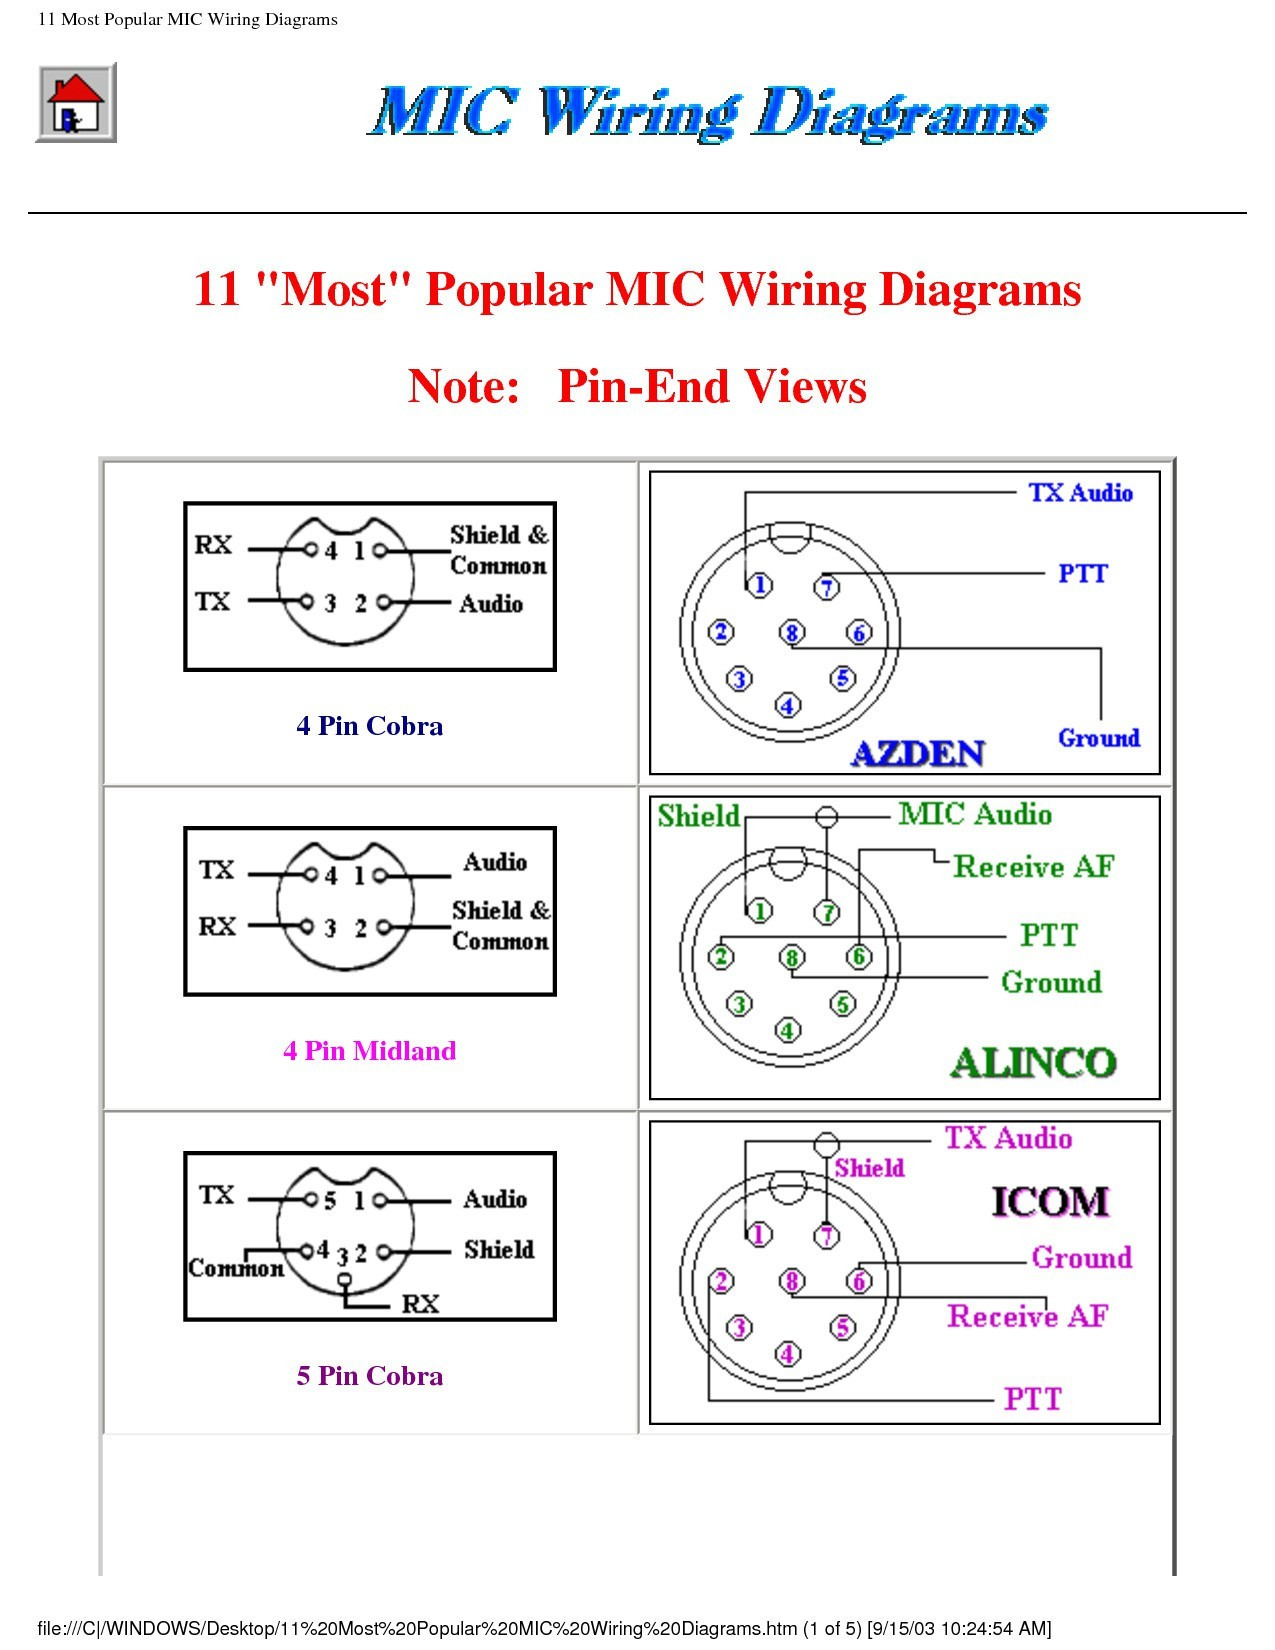 cb mic wiring diagrams - wiring diagram data star ti cb mic wiring diagrams cobra 4 pin cb mic wiring diagram tennisabtlg-tus-erfenbach.de